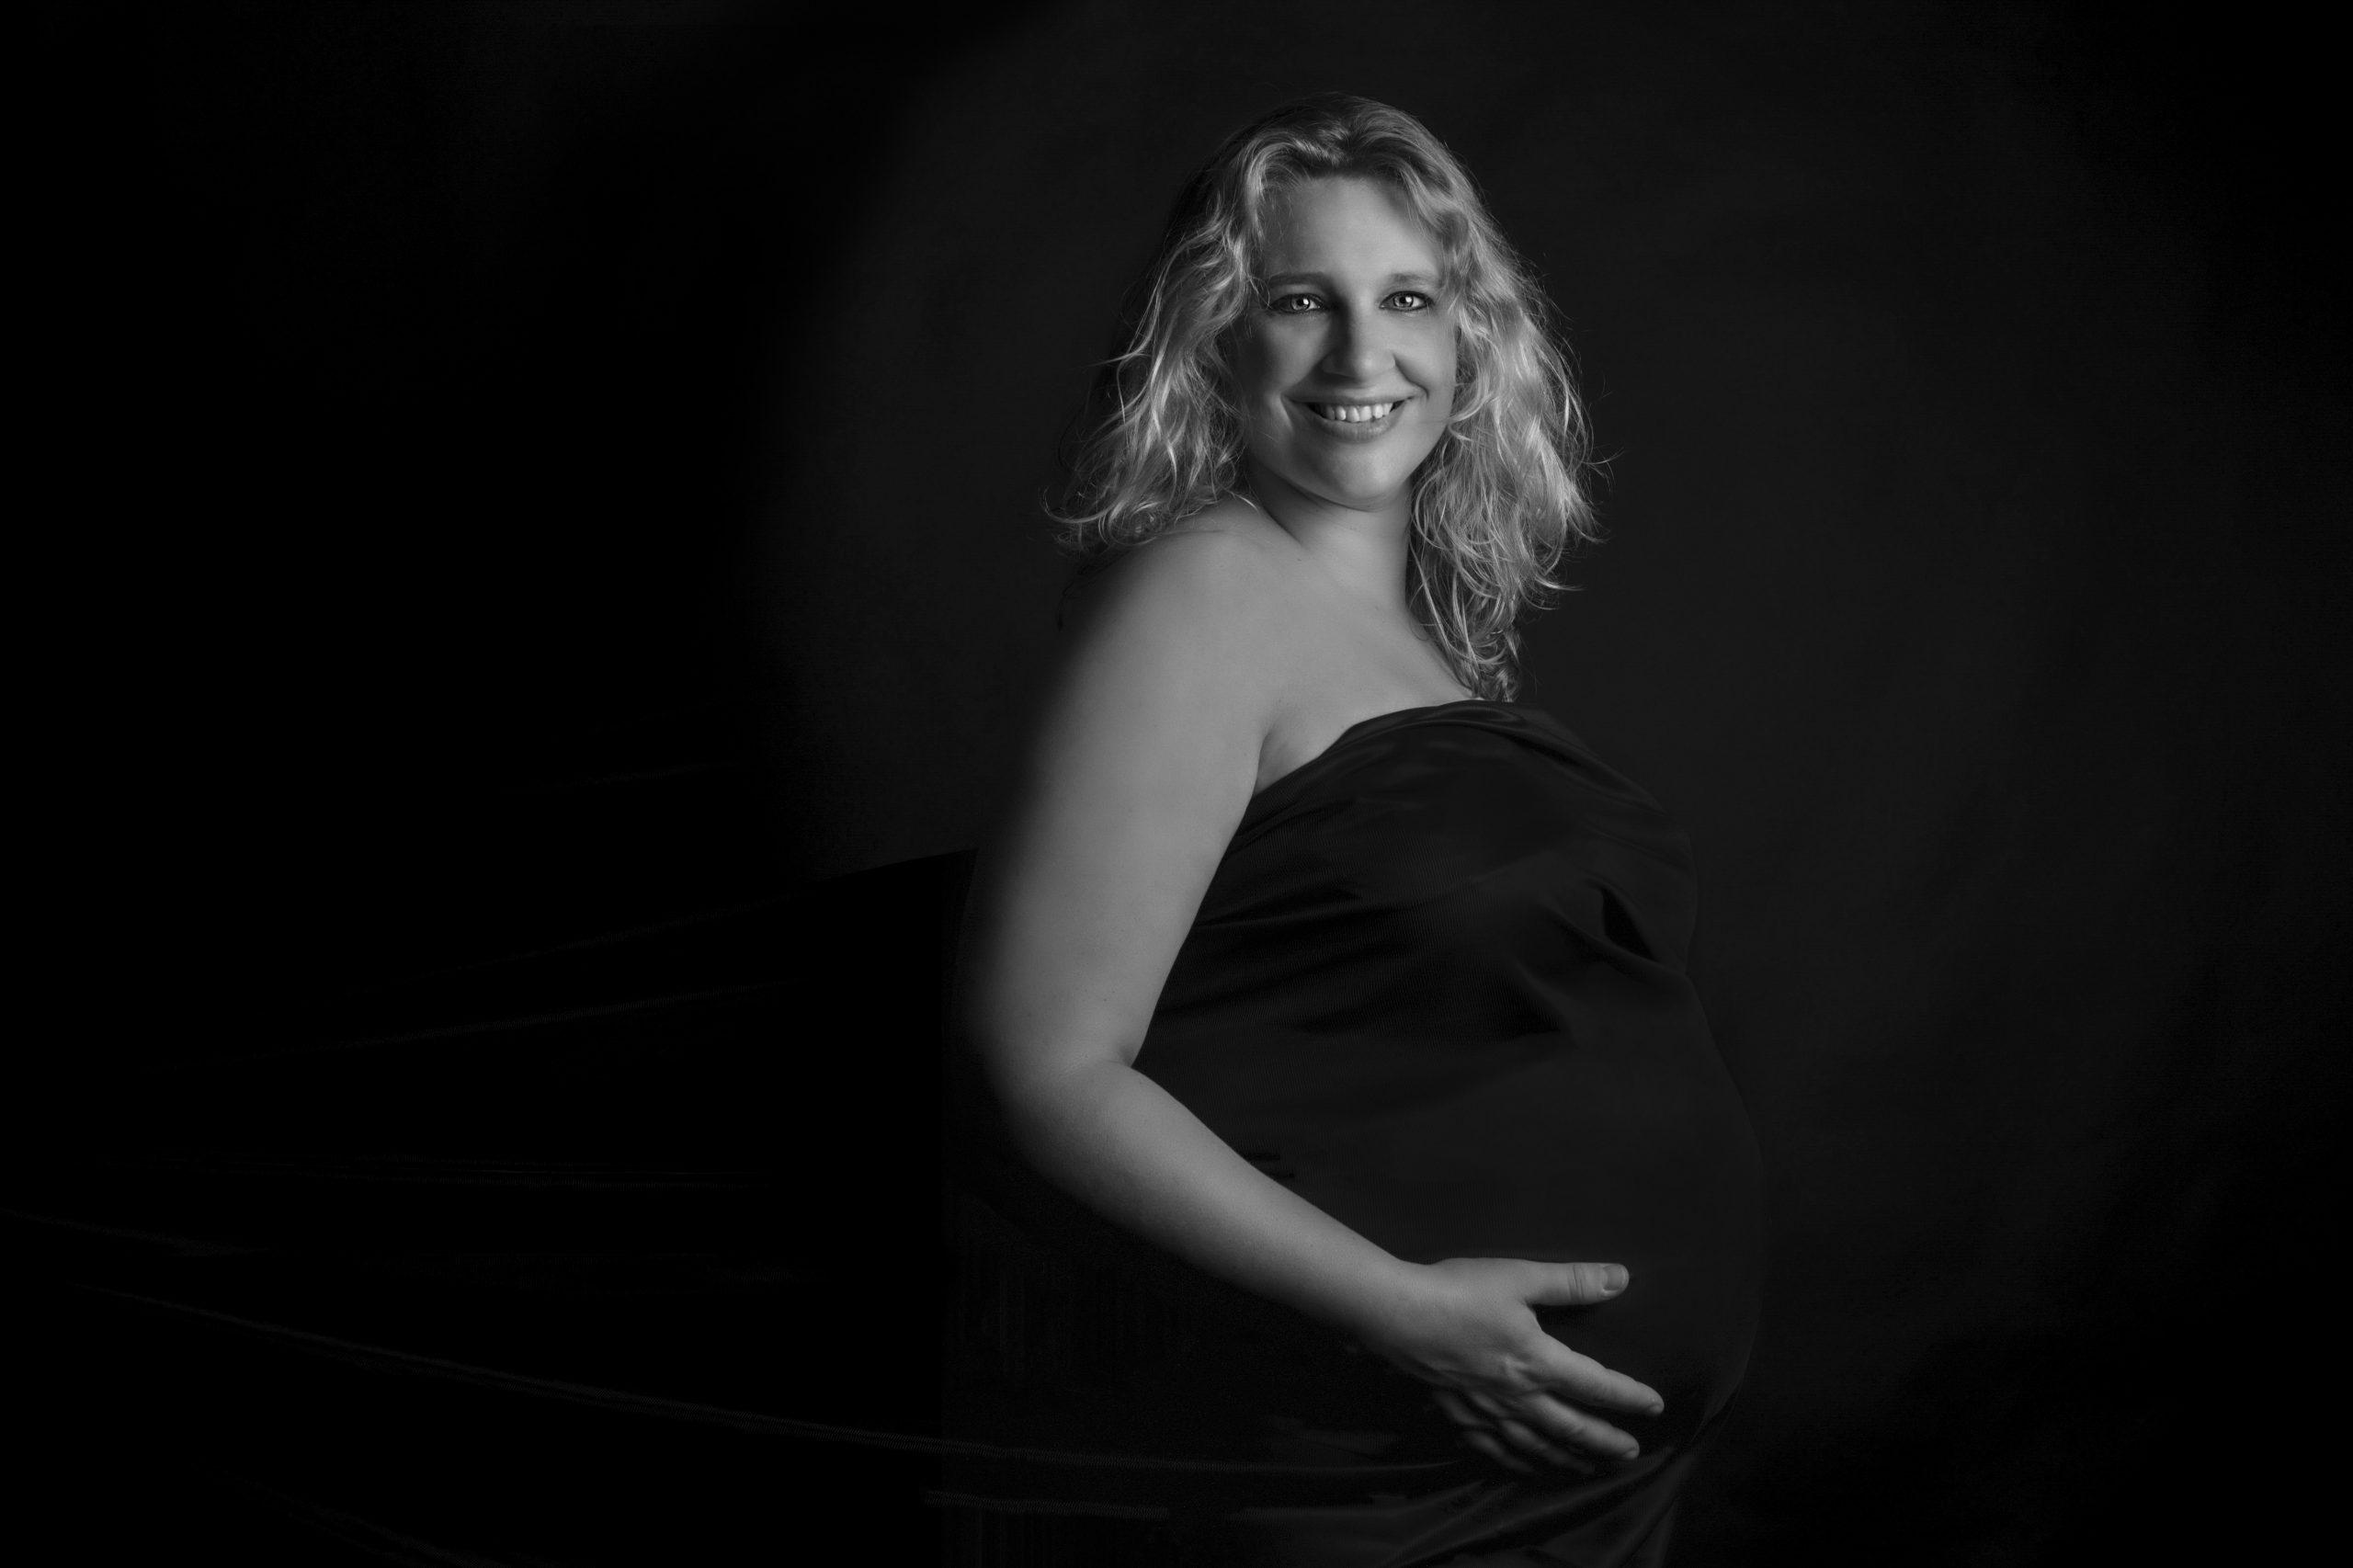 Zwangerschapsreportage I&E